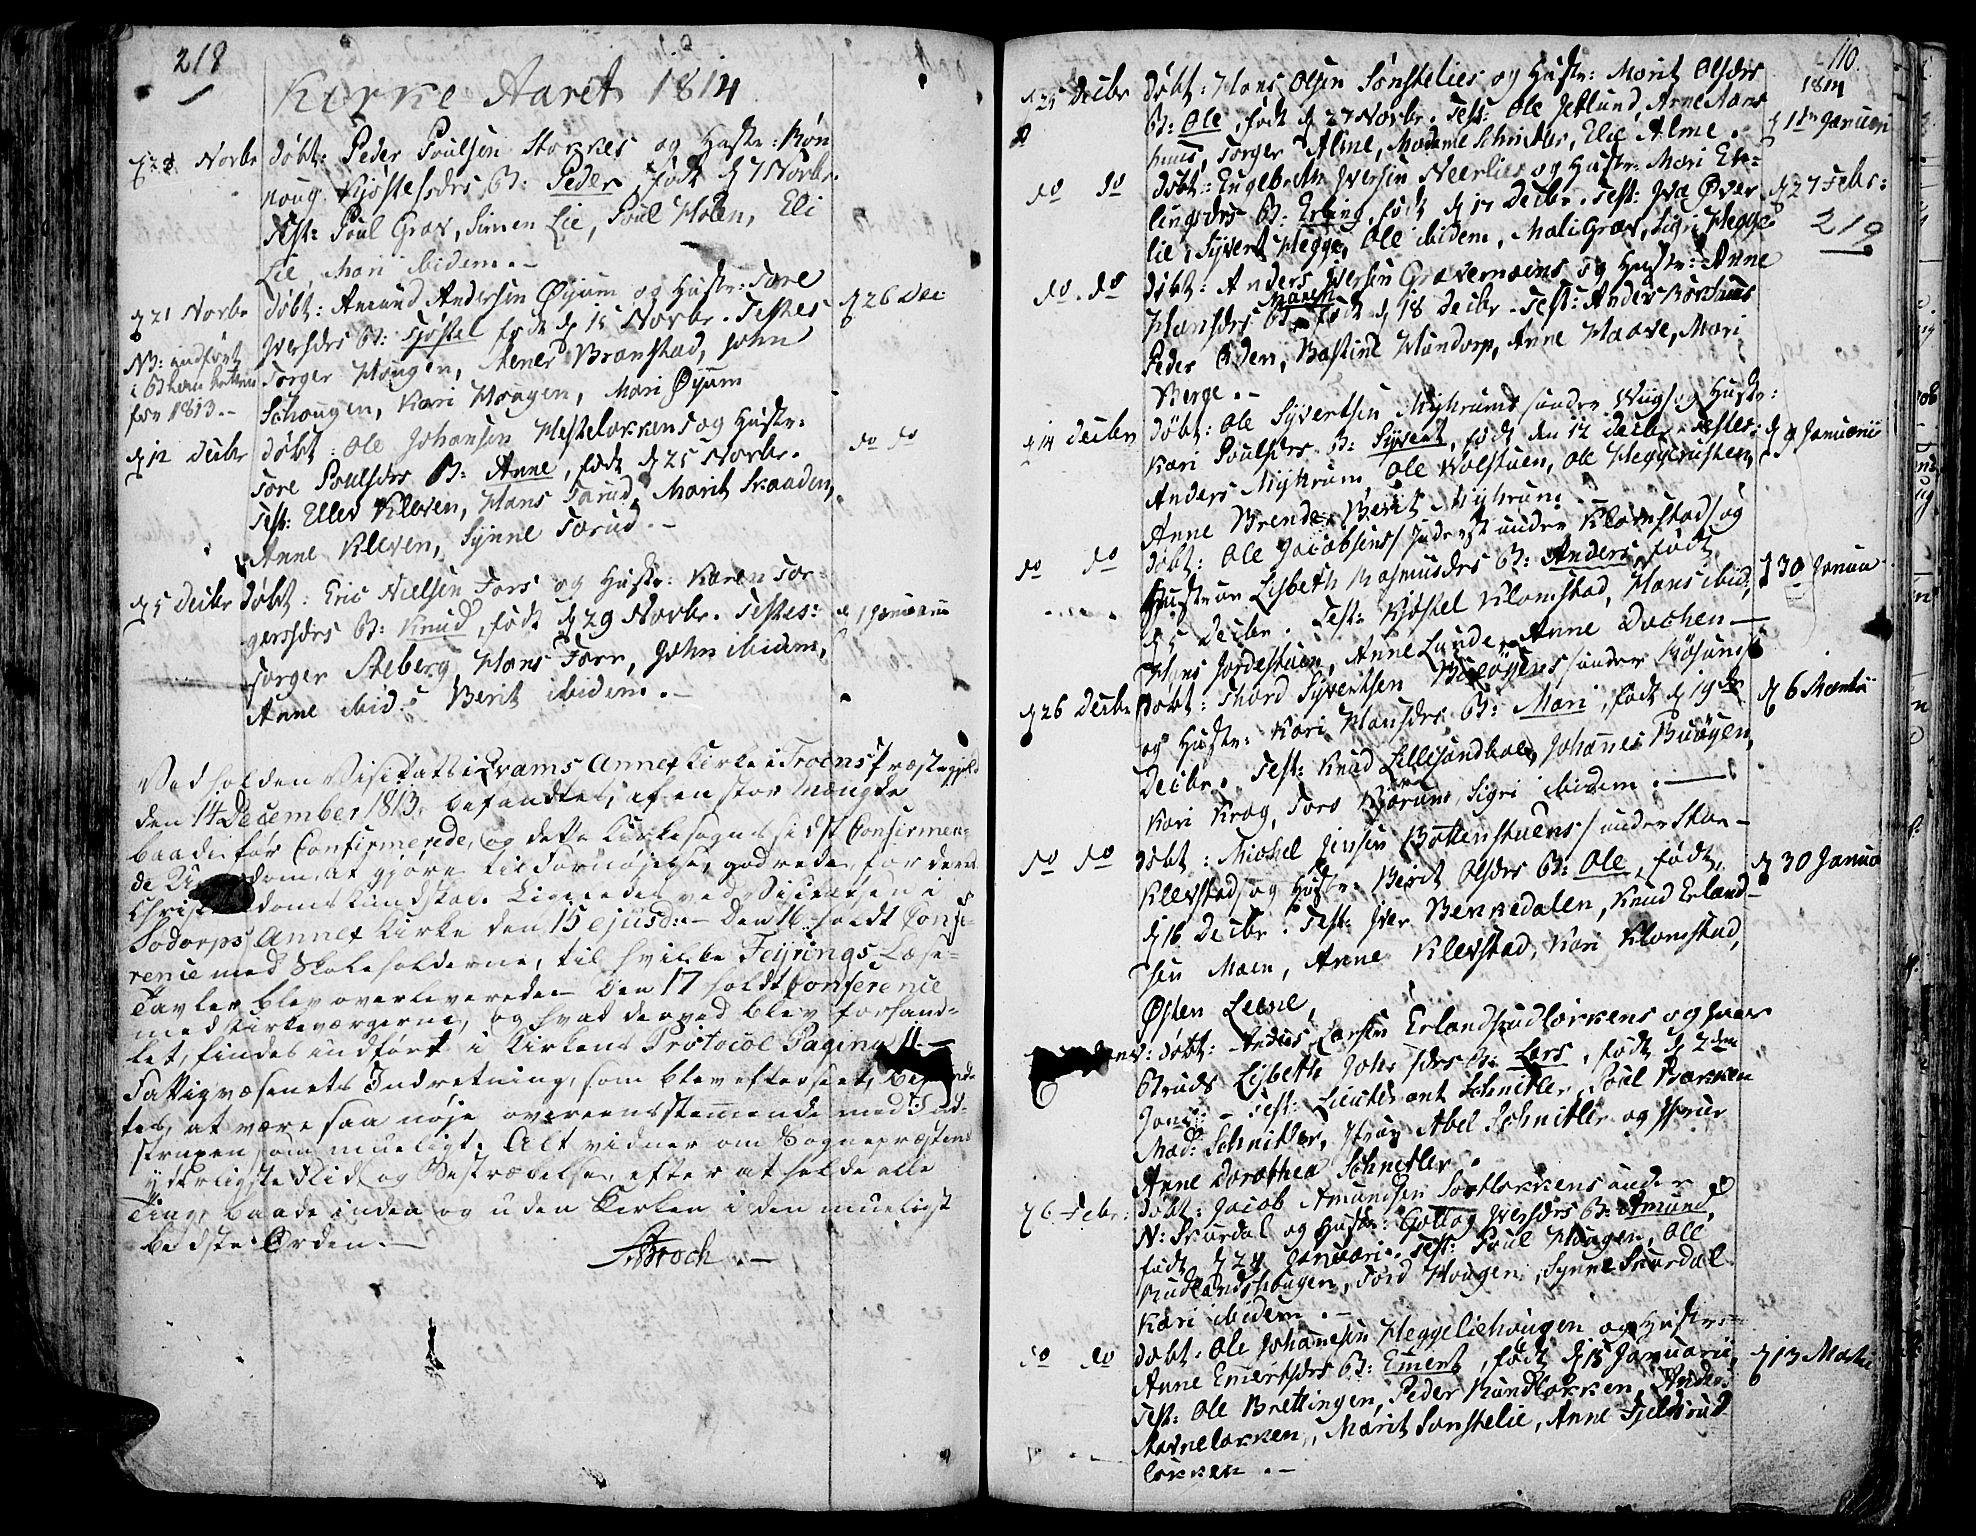 SAH, Fron prestekontor, H/Ha/Haa/L0001: Ministerialbok nr. 1, 1799-1816, s. 218-219